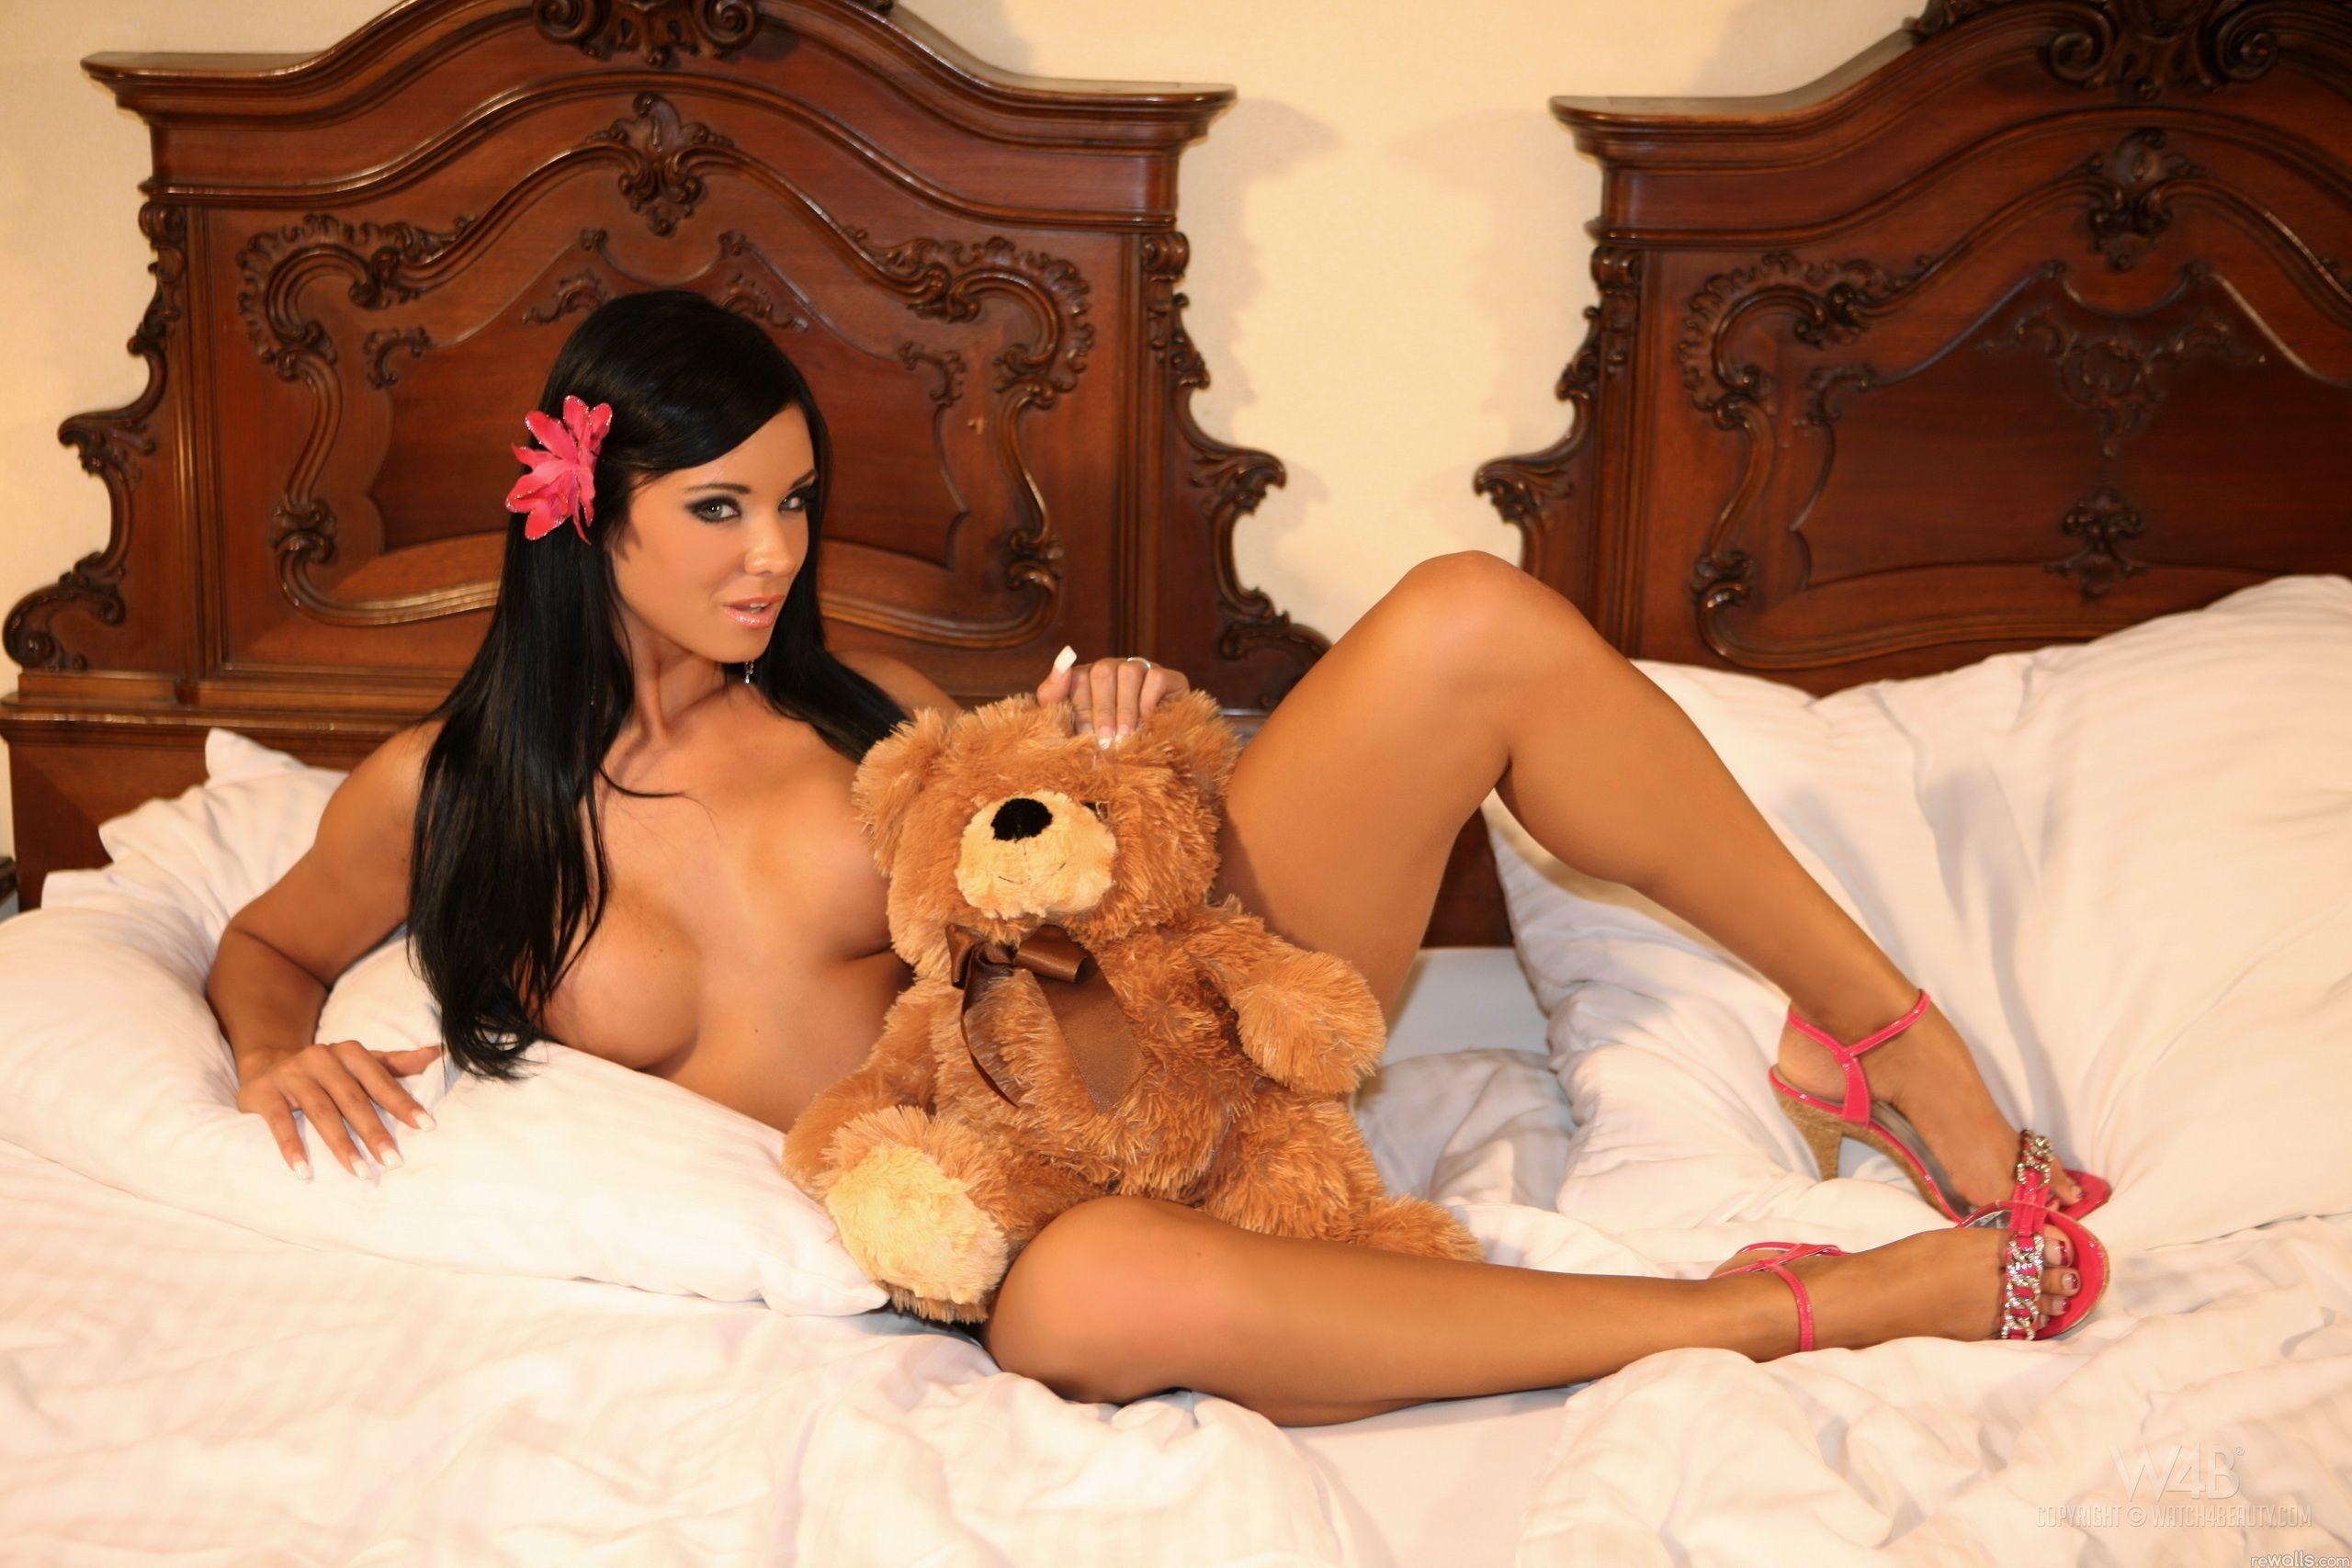 Секси девушки с игрушками 2 фотография